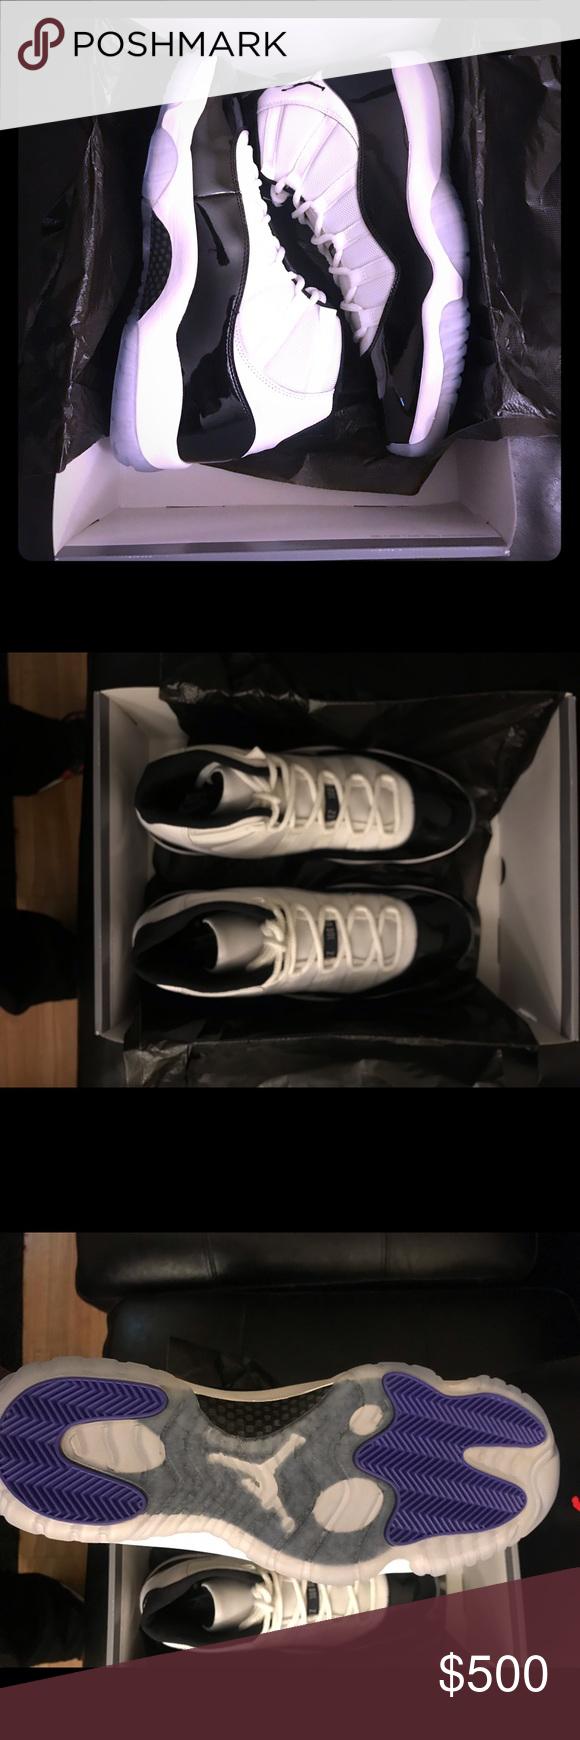 big sale 13062 d9732 Jordan Concord 11's Brand New NWT | My Posh Picks | Jordans ...